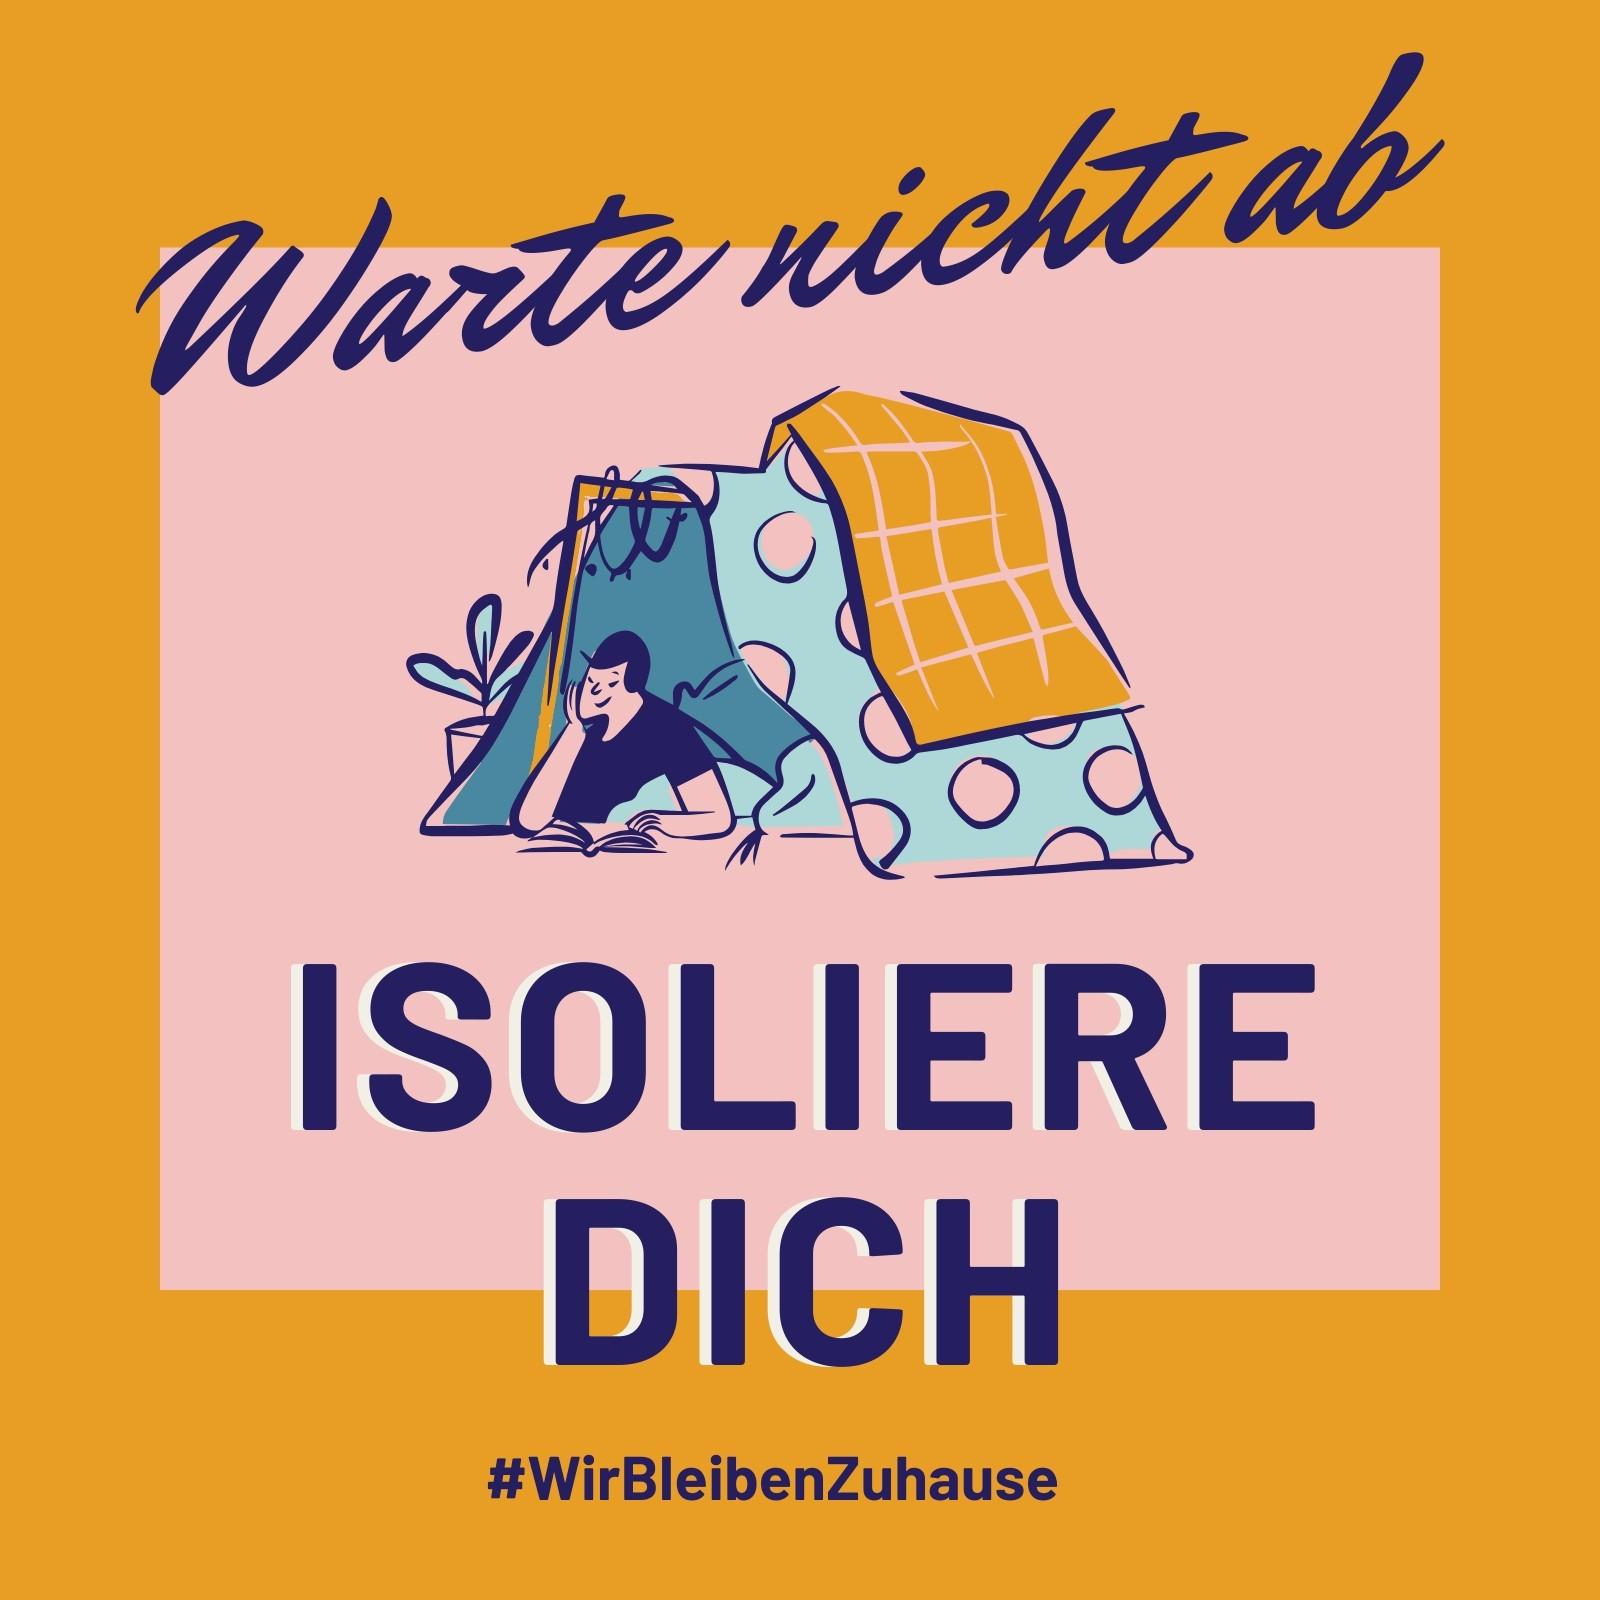 Gelb-pinker Selbstisolation & Gesundheit Instagram Post